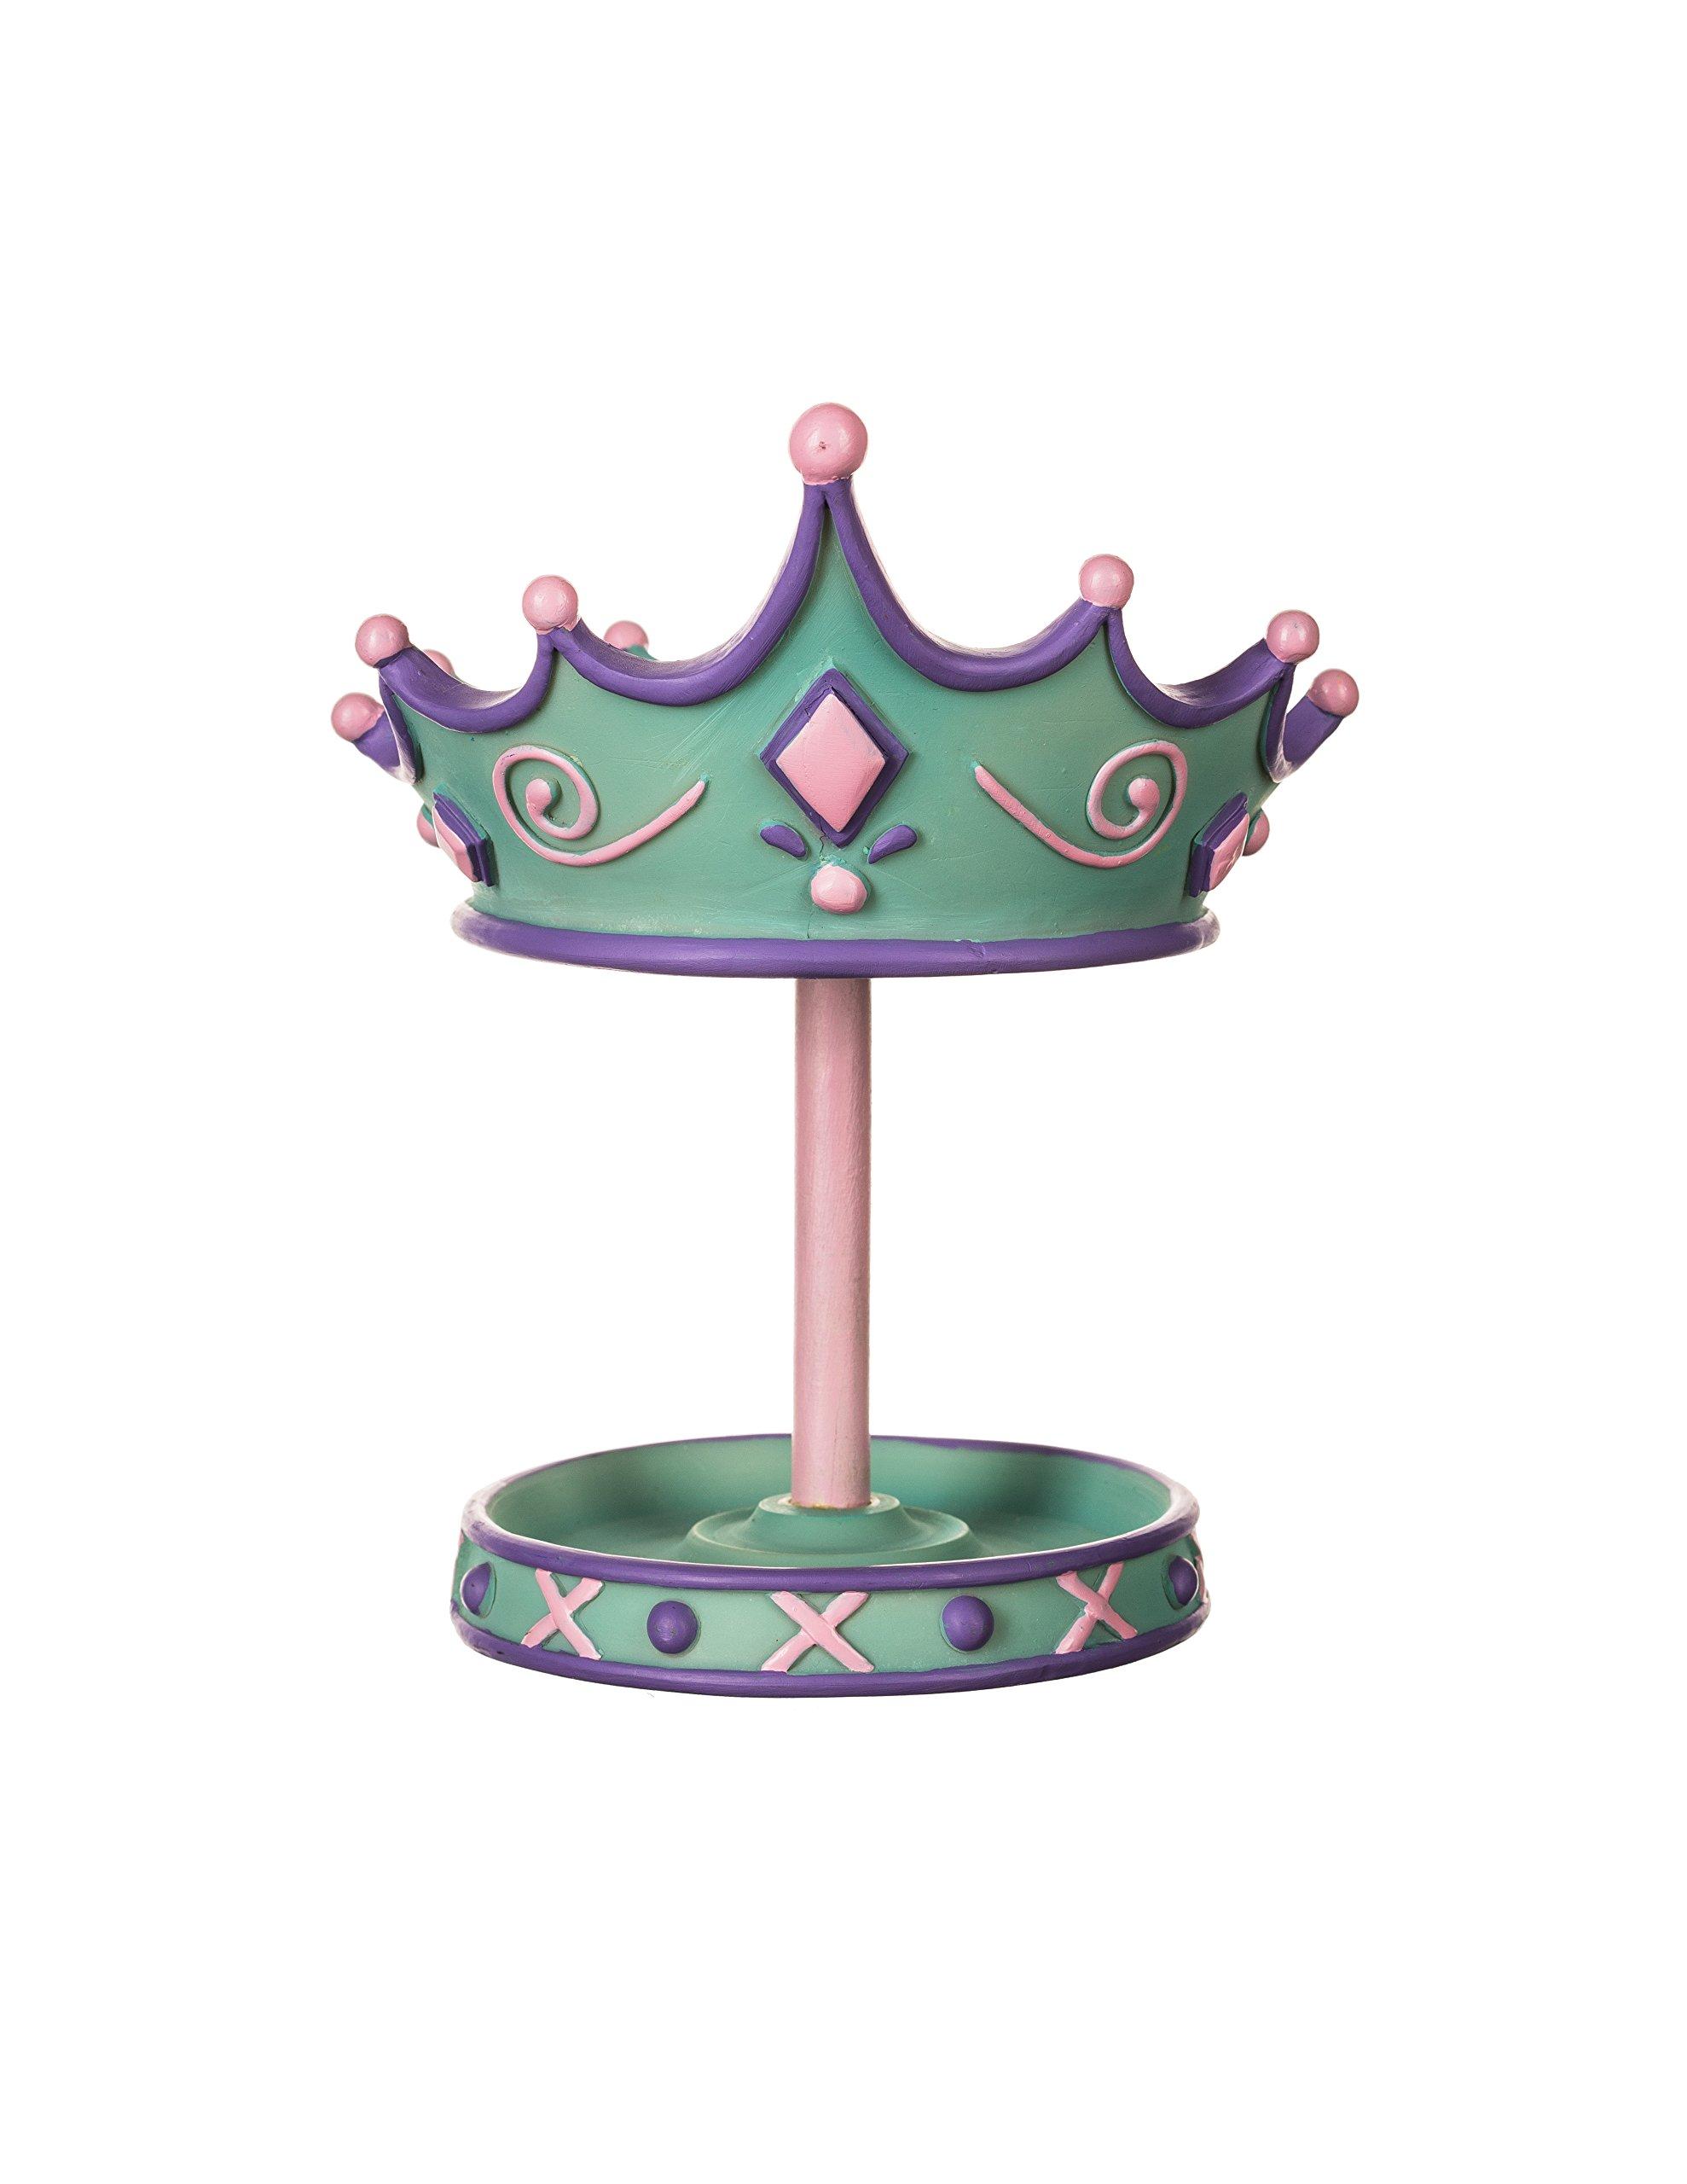 Borders Unlimited Crown Toothbrush Holder Princess Camryn,